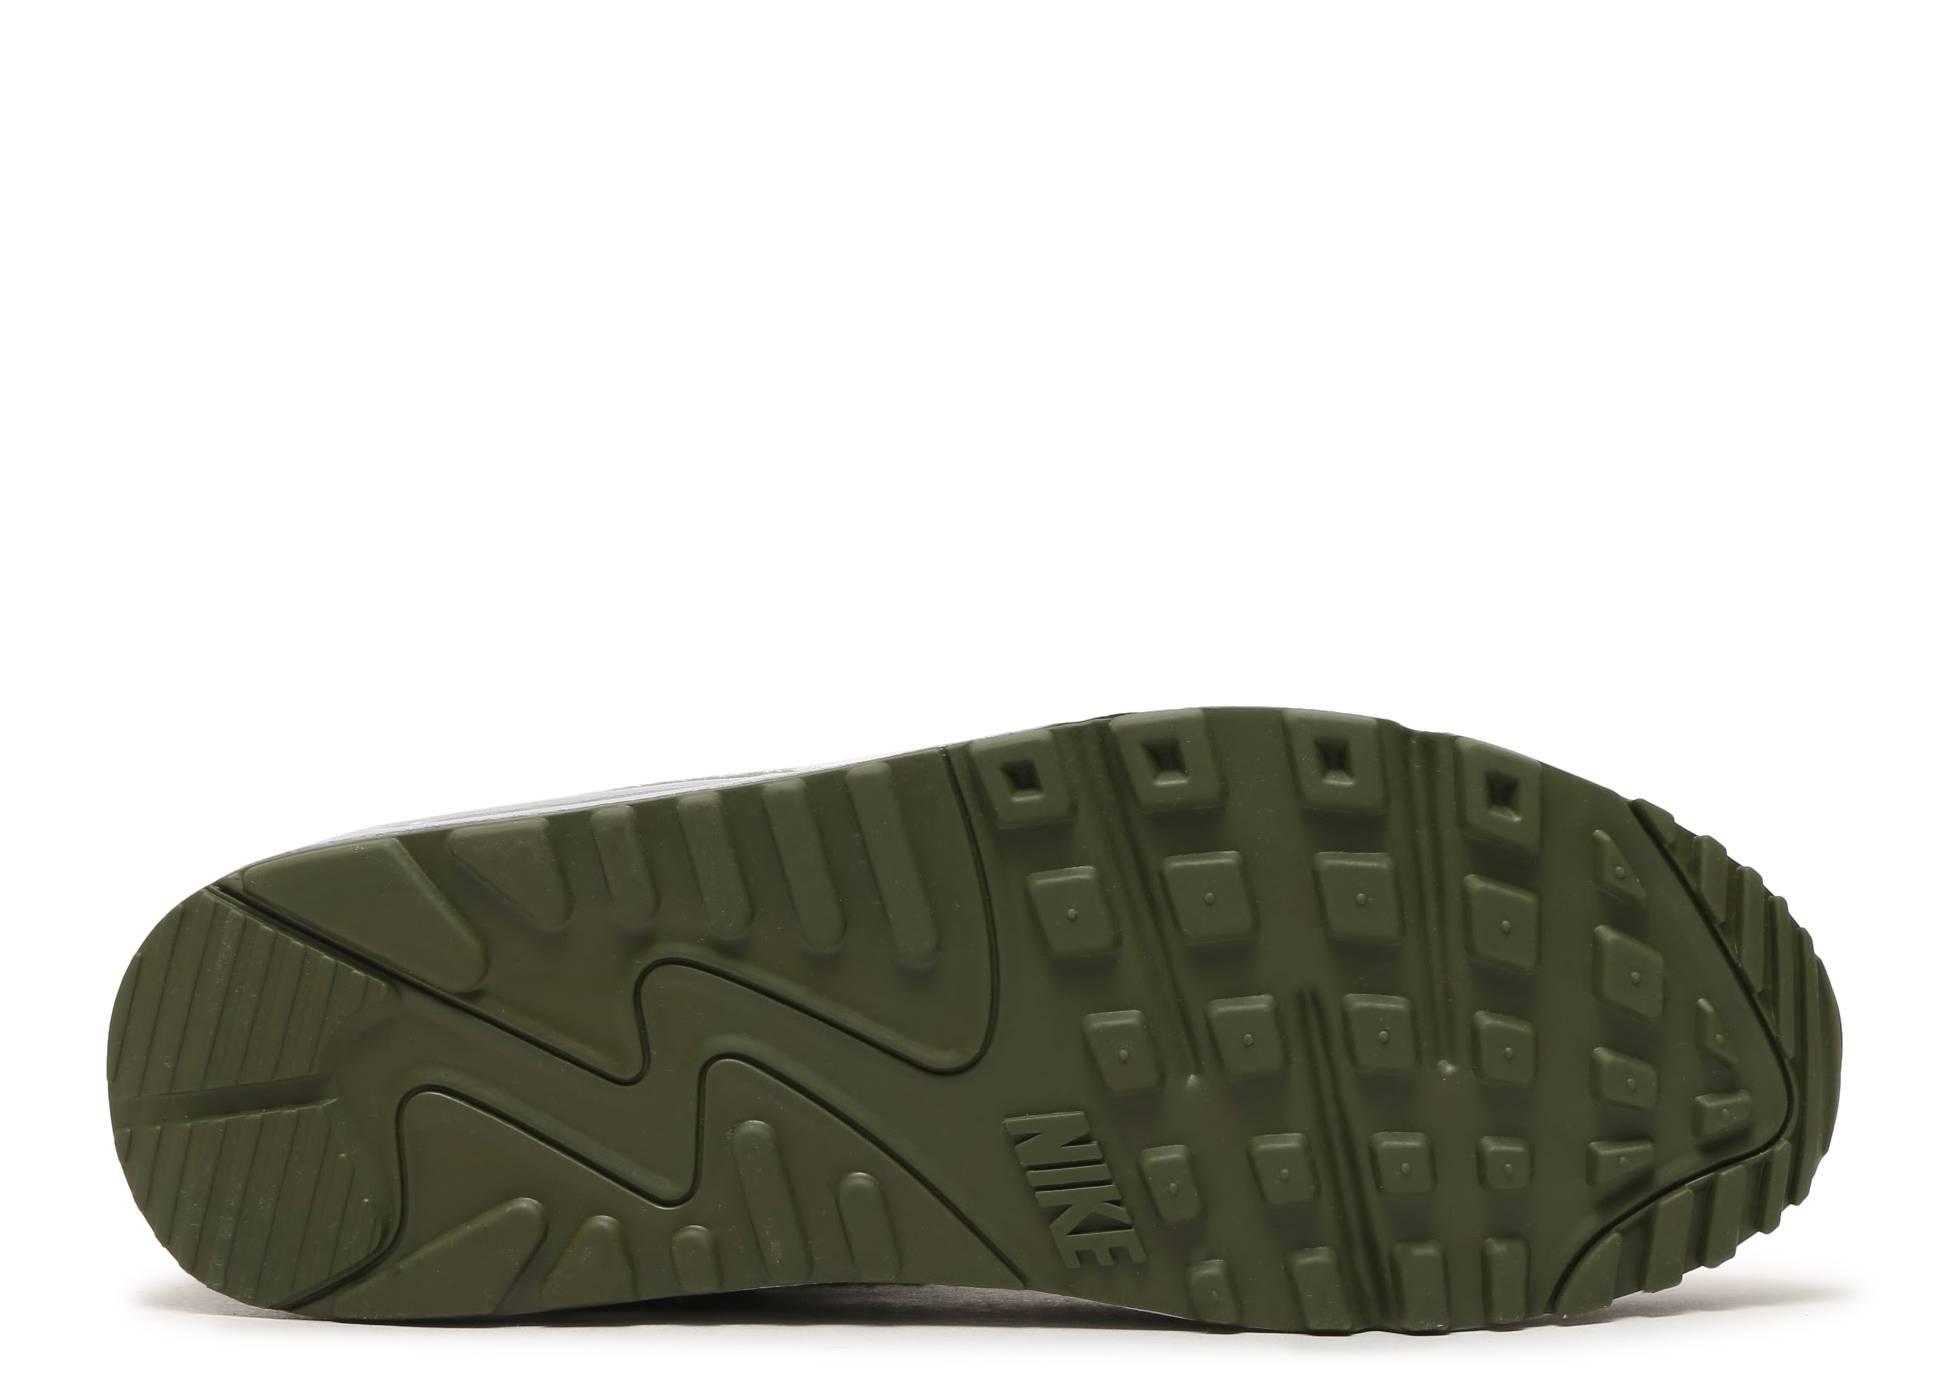 meet 128ea 4a313 AIR MAX 90 HAL - Nike - ah9974 002 - black black-medium olive-flt silver    Flight Club